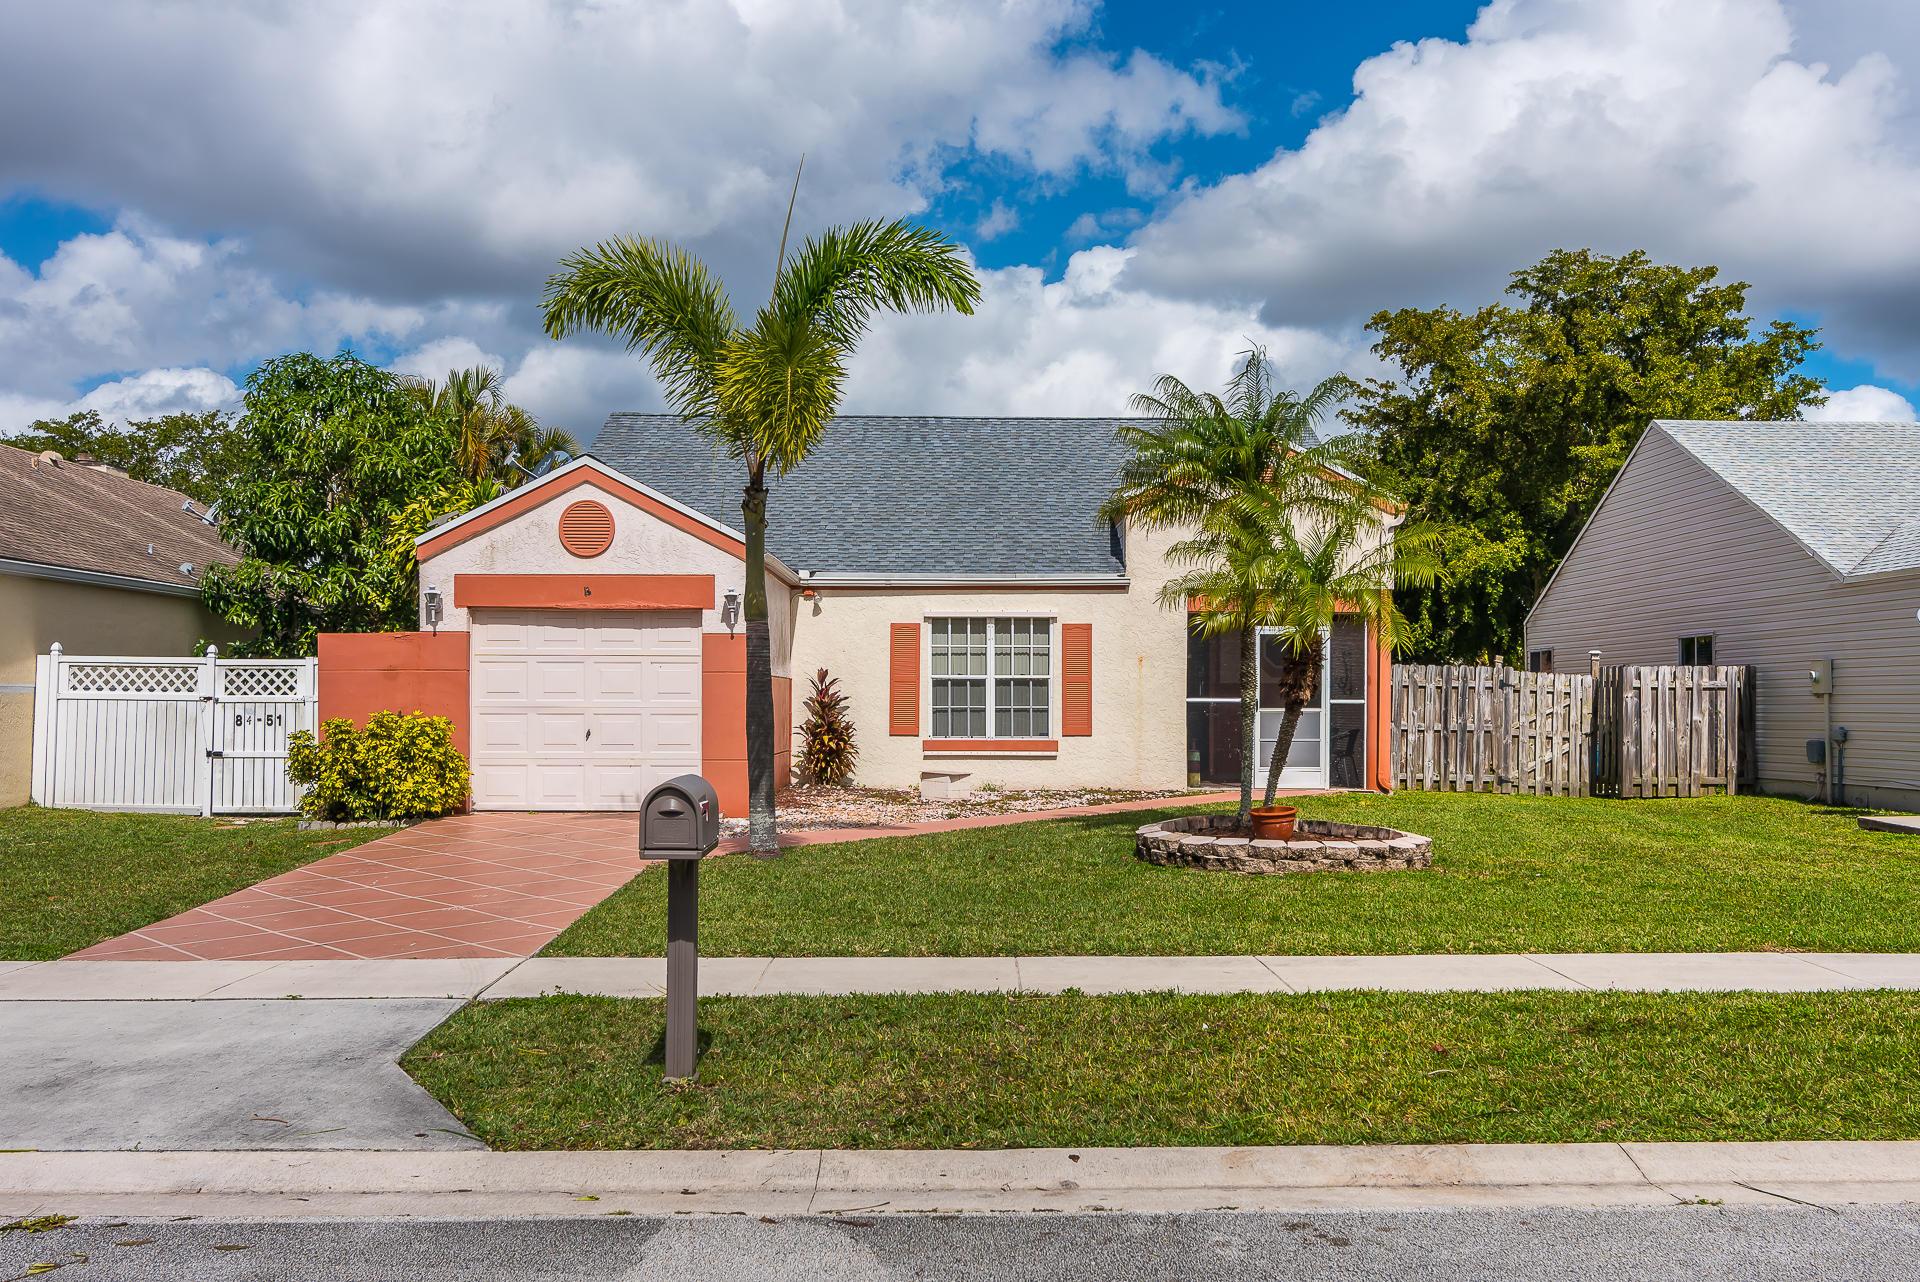 8451 Dynasty Drive, Boca Raton, Florida 33433, 3 Bedrooms Bedrooms, ,2.2 BathroomsBathrooms,Single Family,For Sale,Dynasty,RX-10505132